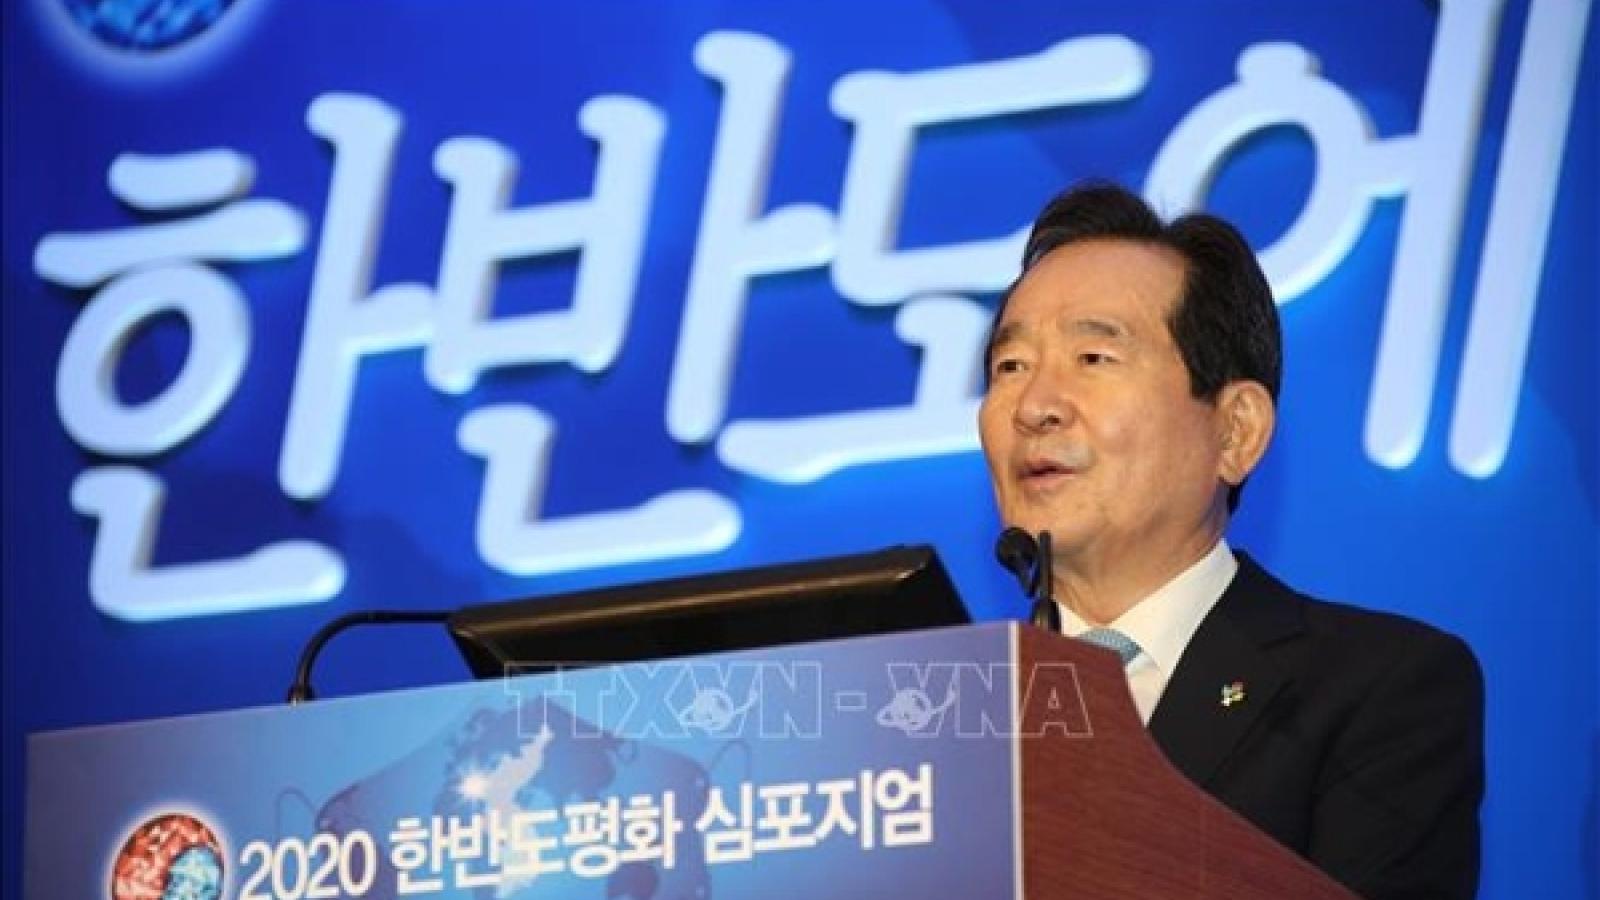 Speaker Park pushes for closer RoK-Vietnam cooperation